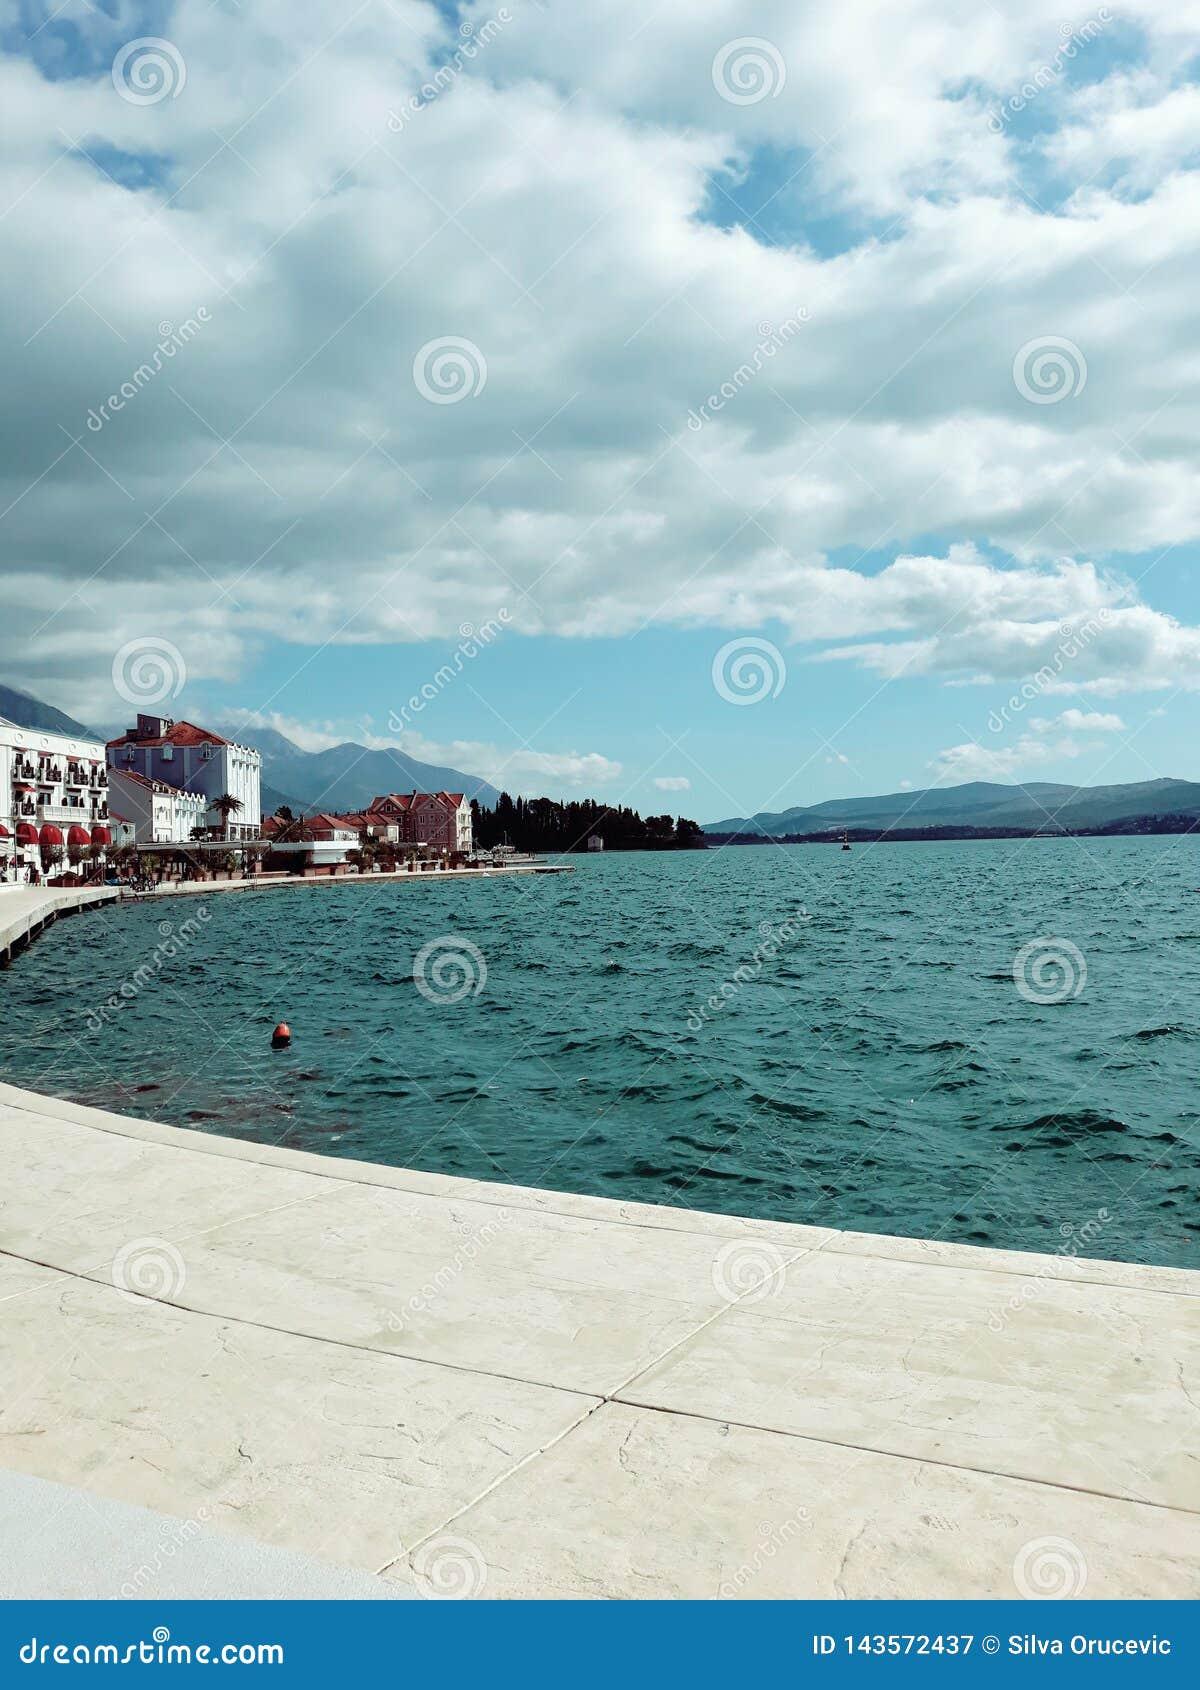 Coast of Tivat, Montenegro